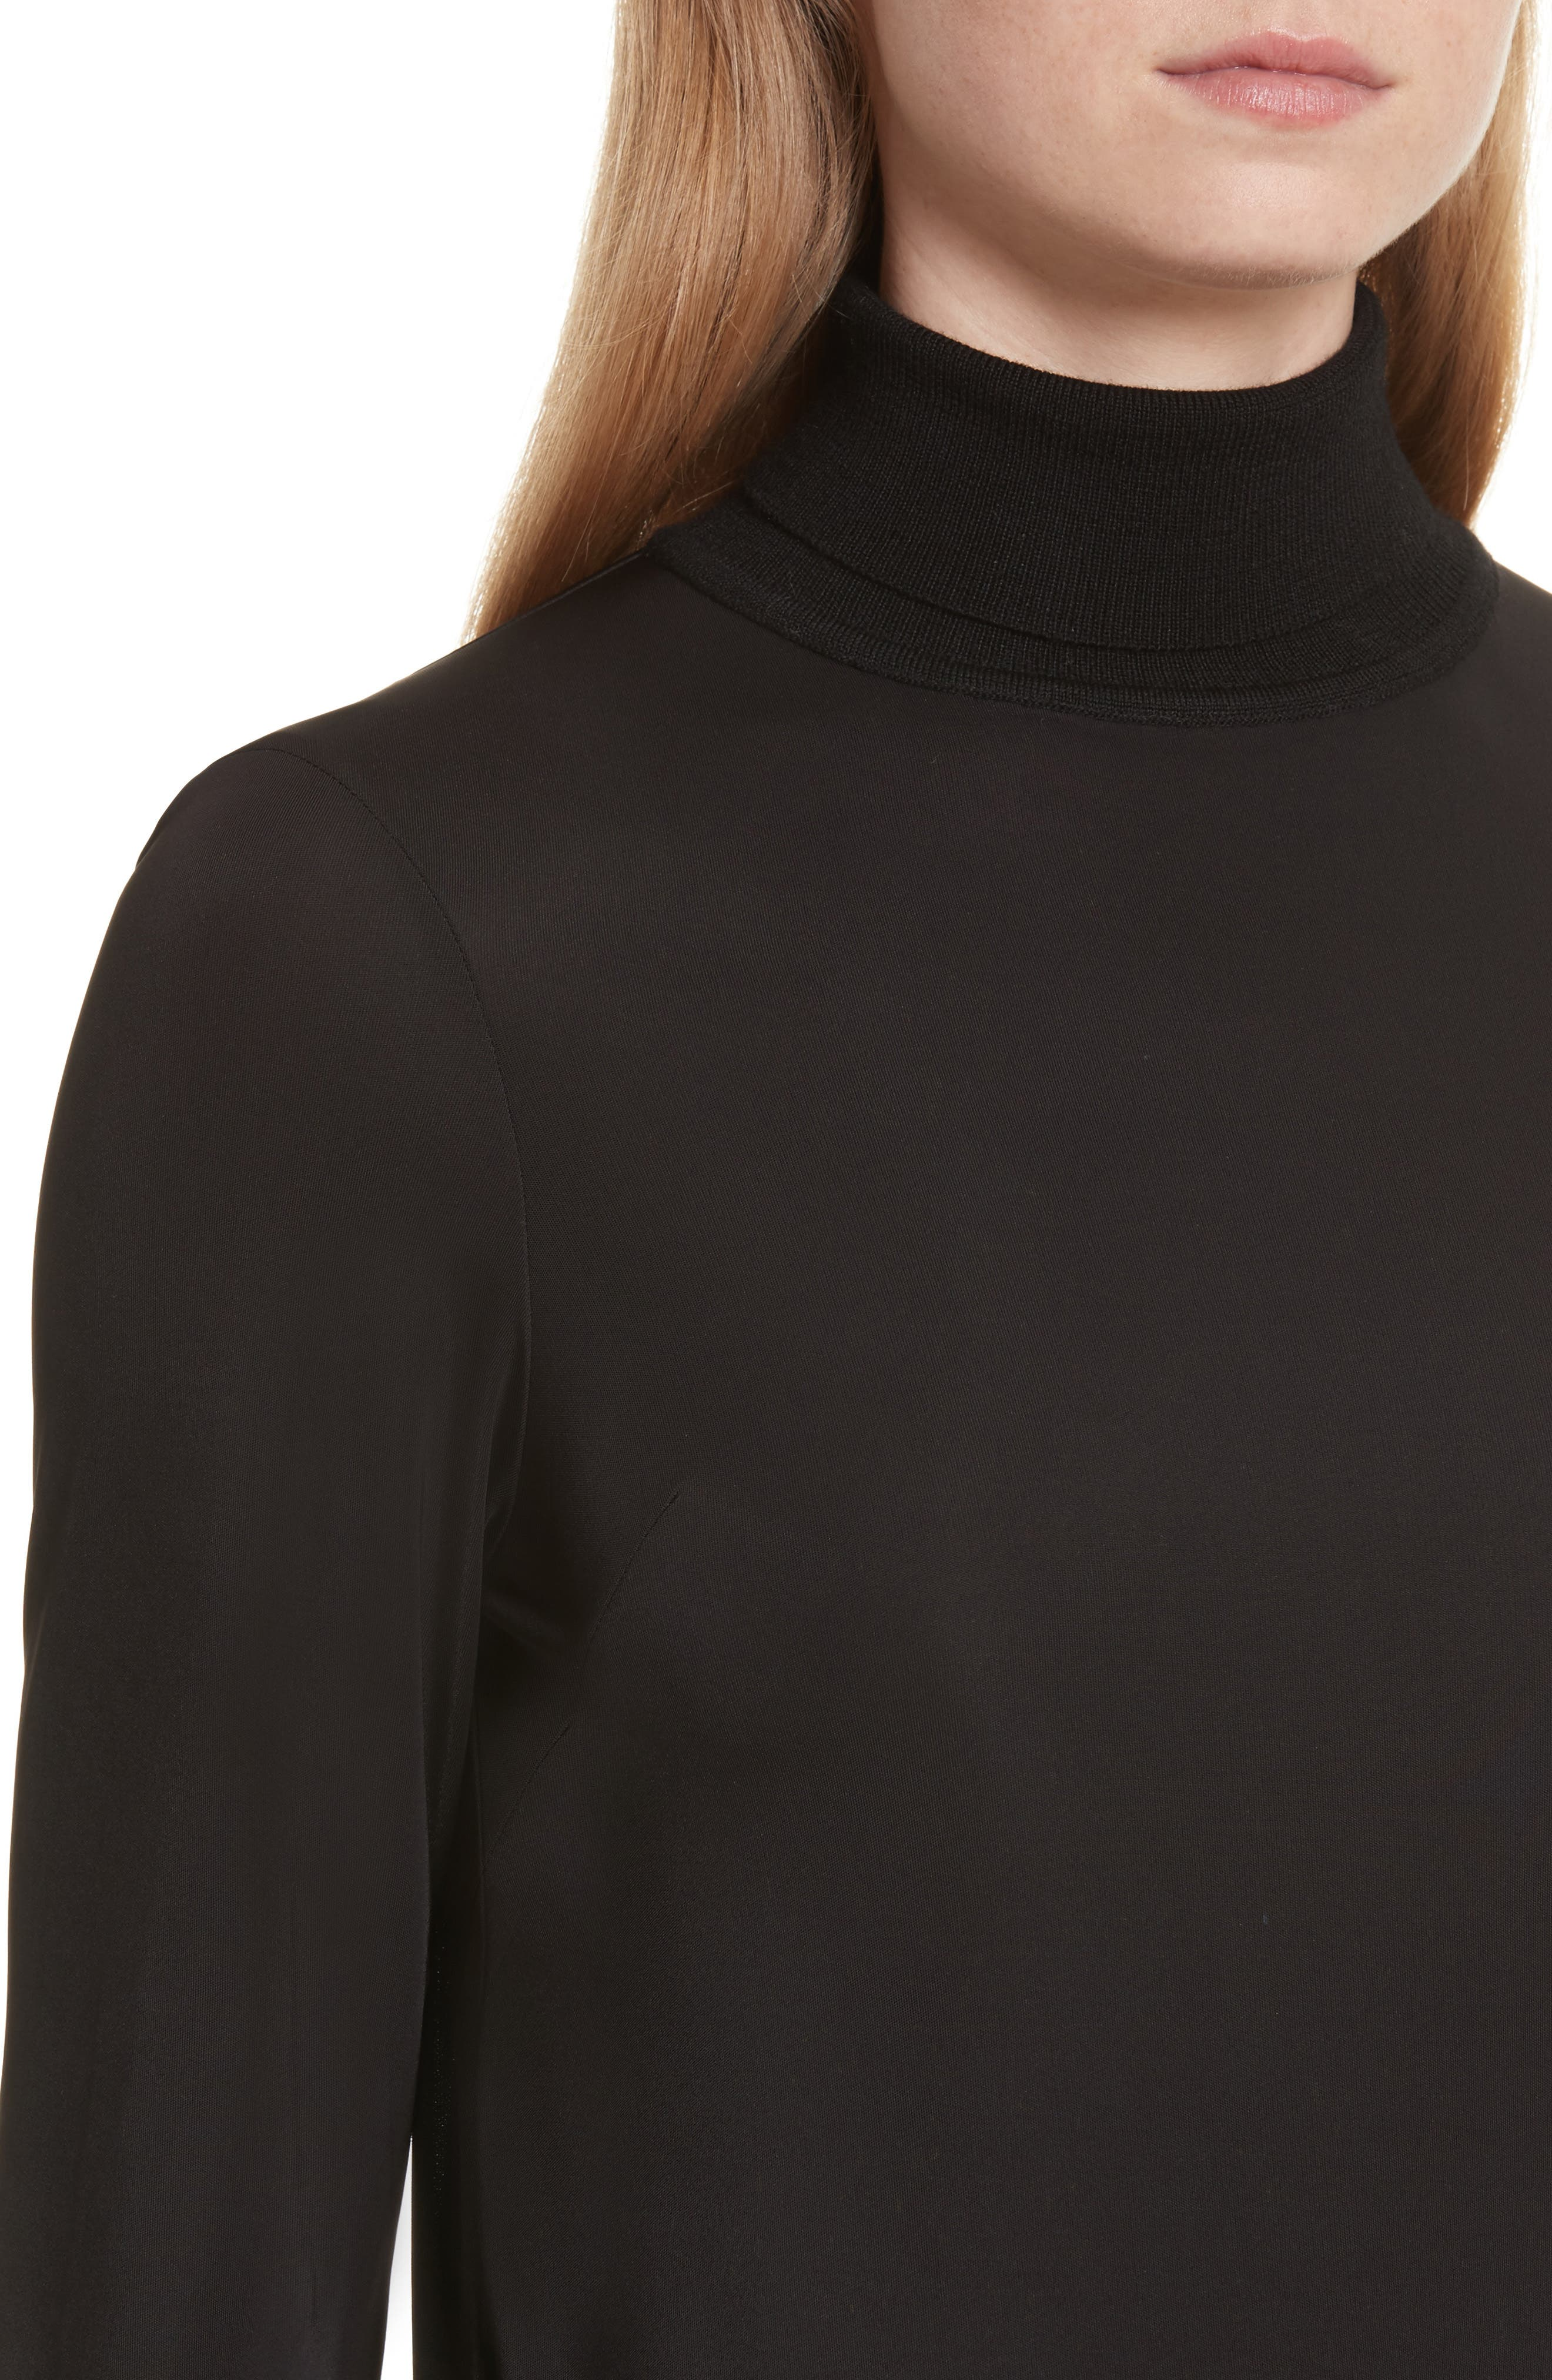 Merino Trim Turtleneck Sweater,                             Alternate thumbnail 4, color,                             001